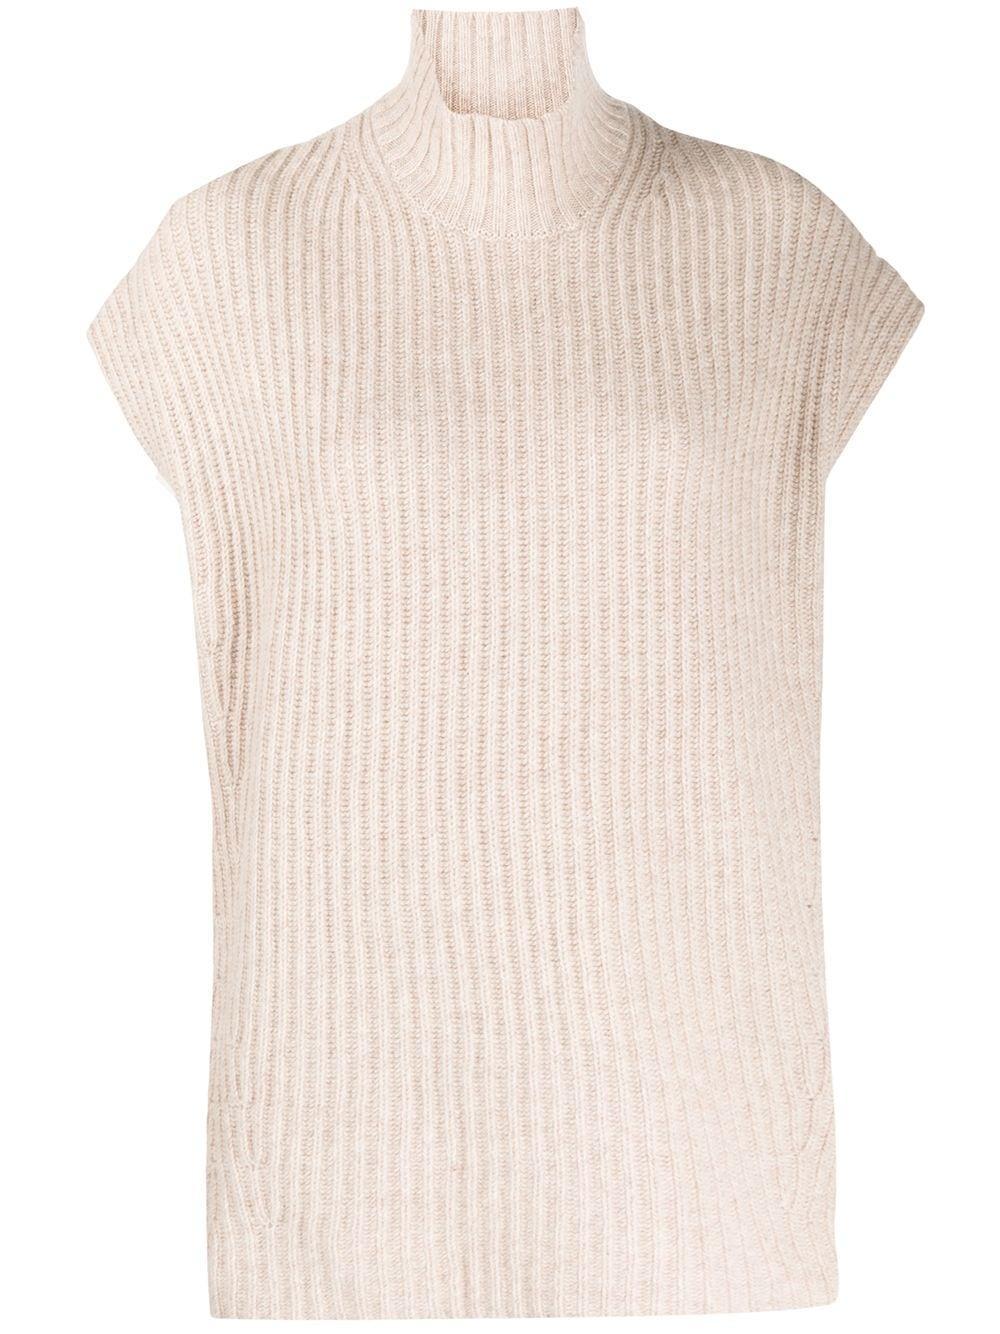 Sleeveless Rib Knit Sweater Item # K1405